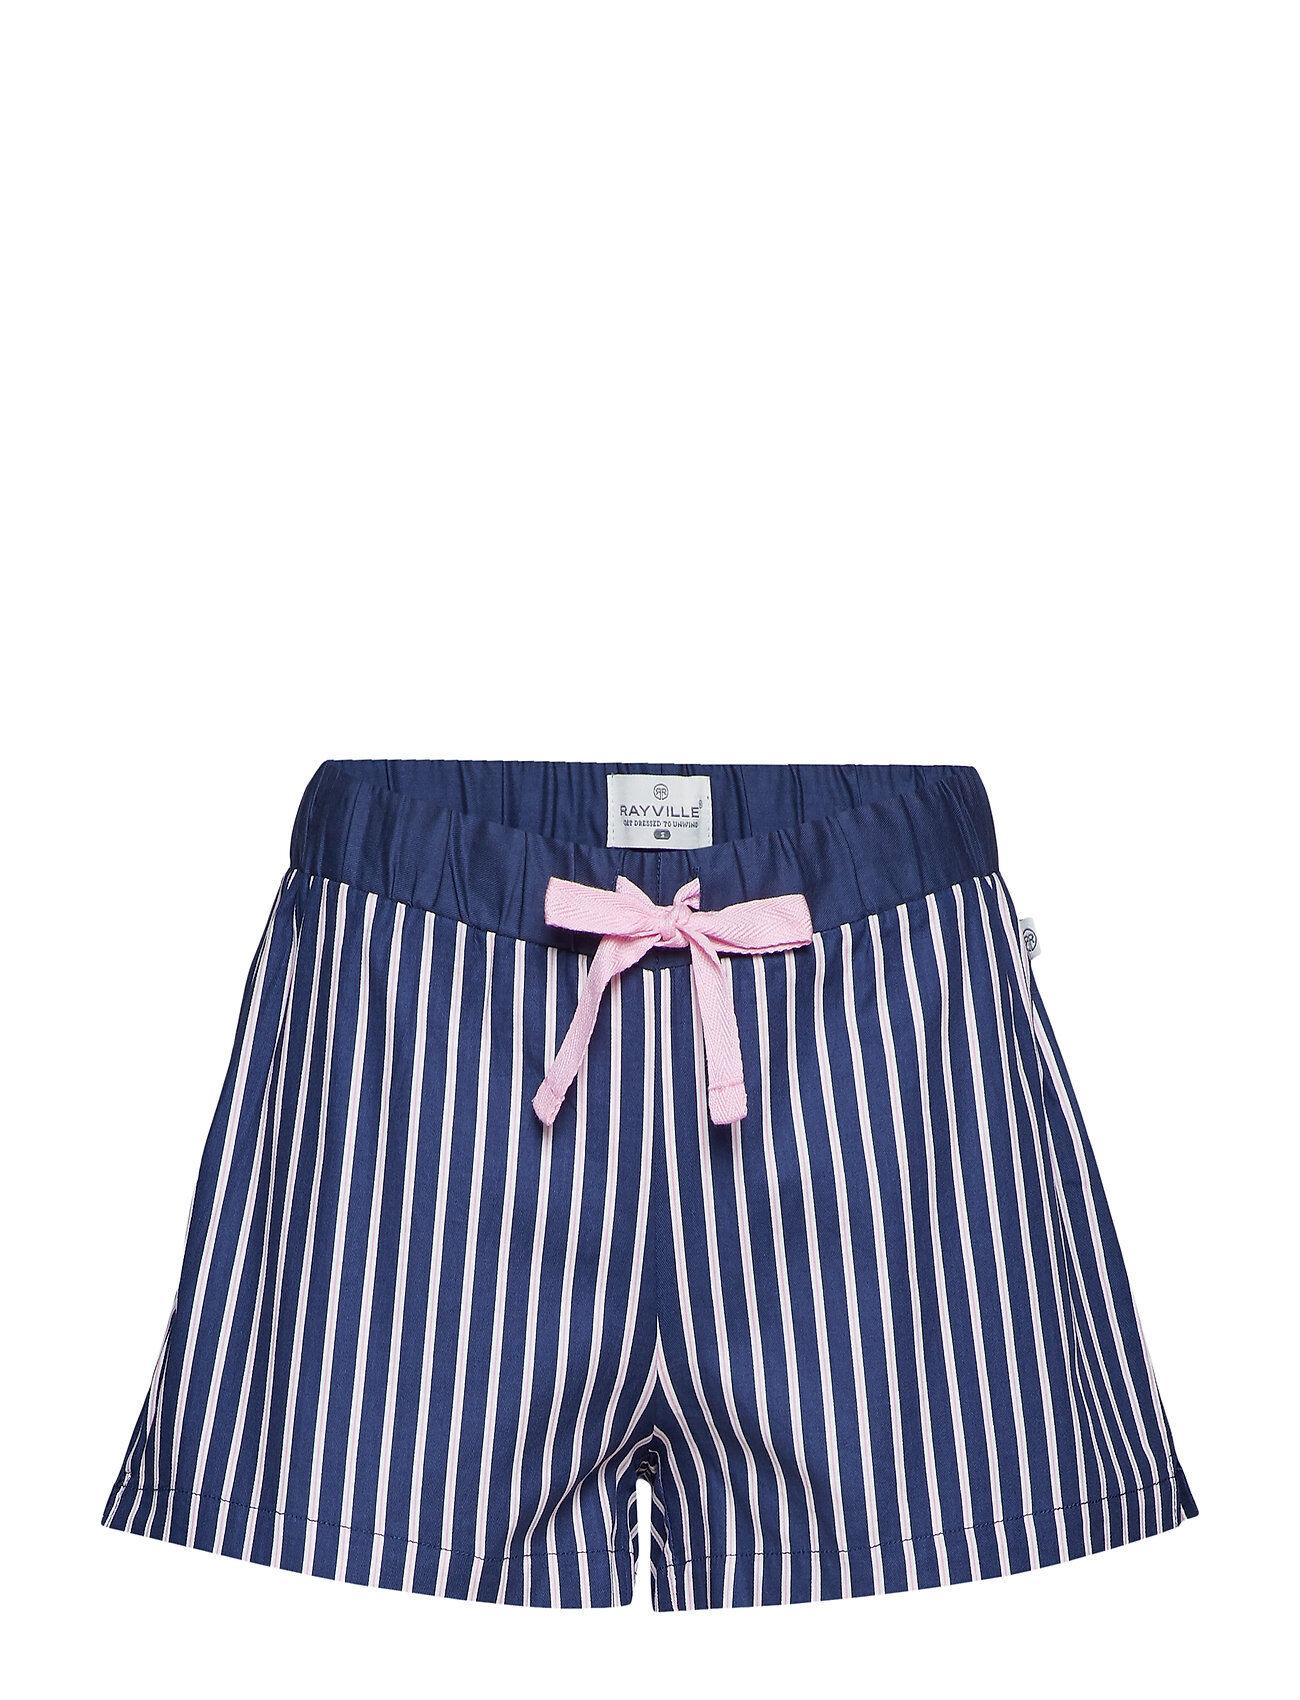 Rayville Alanis Pj Shorts Pencil Stripe